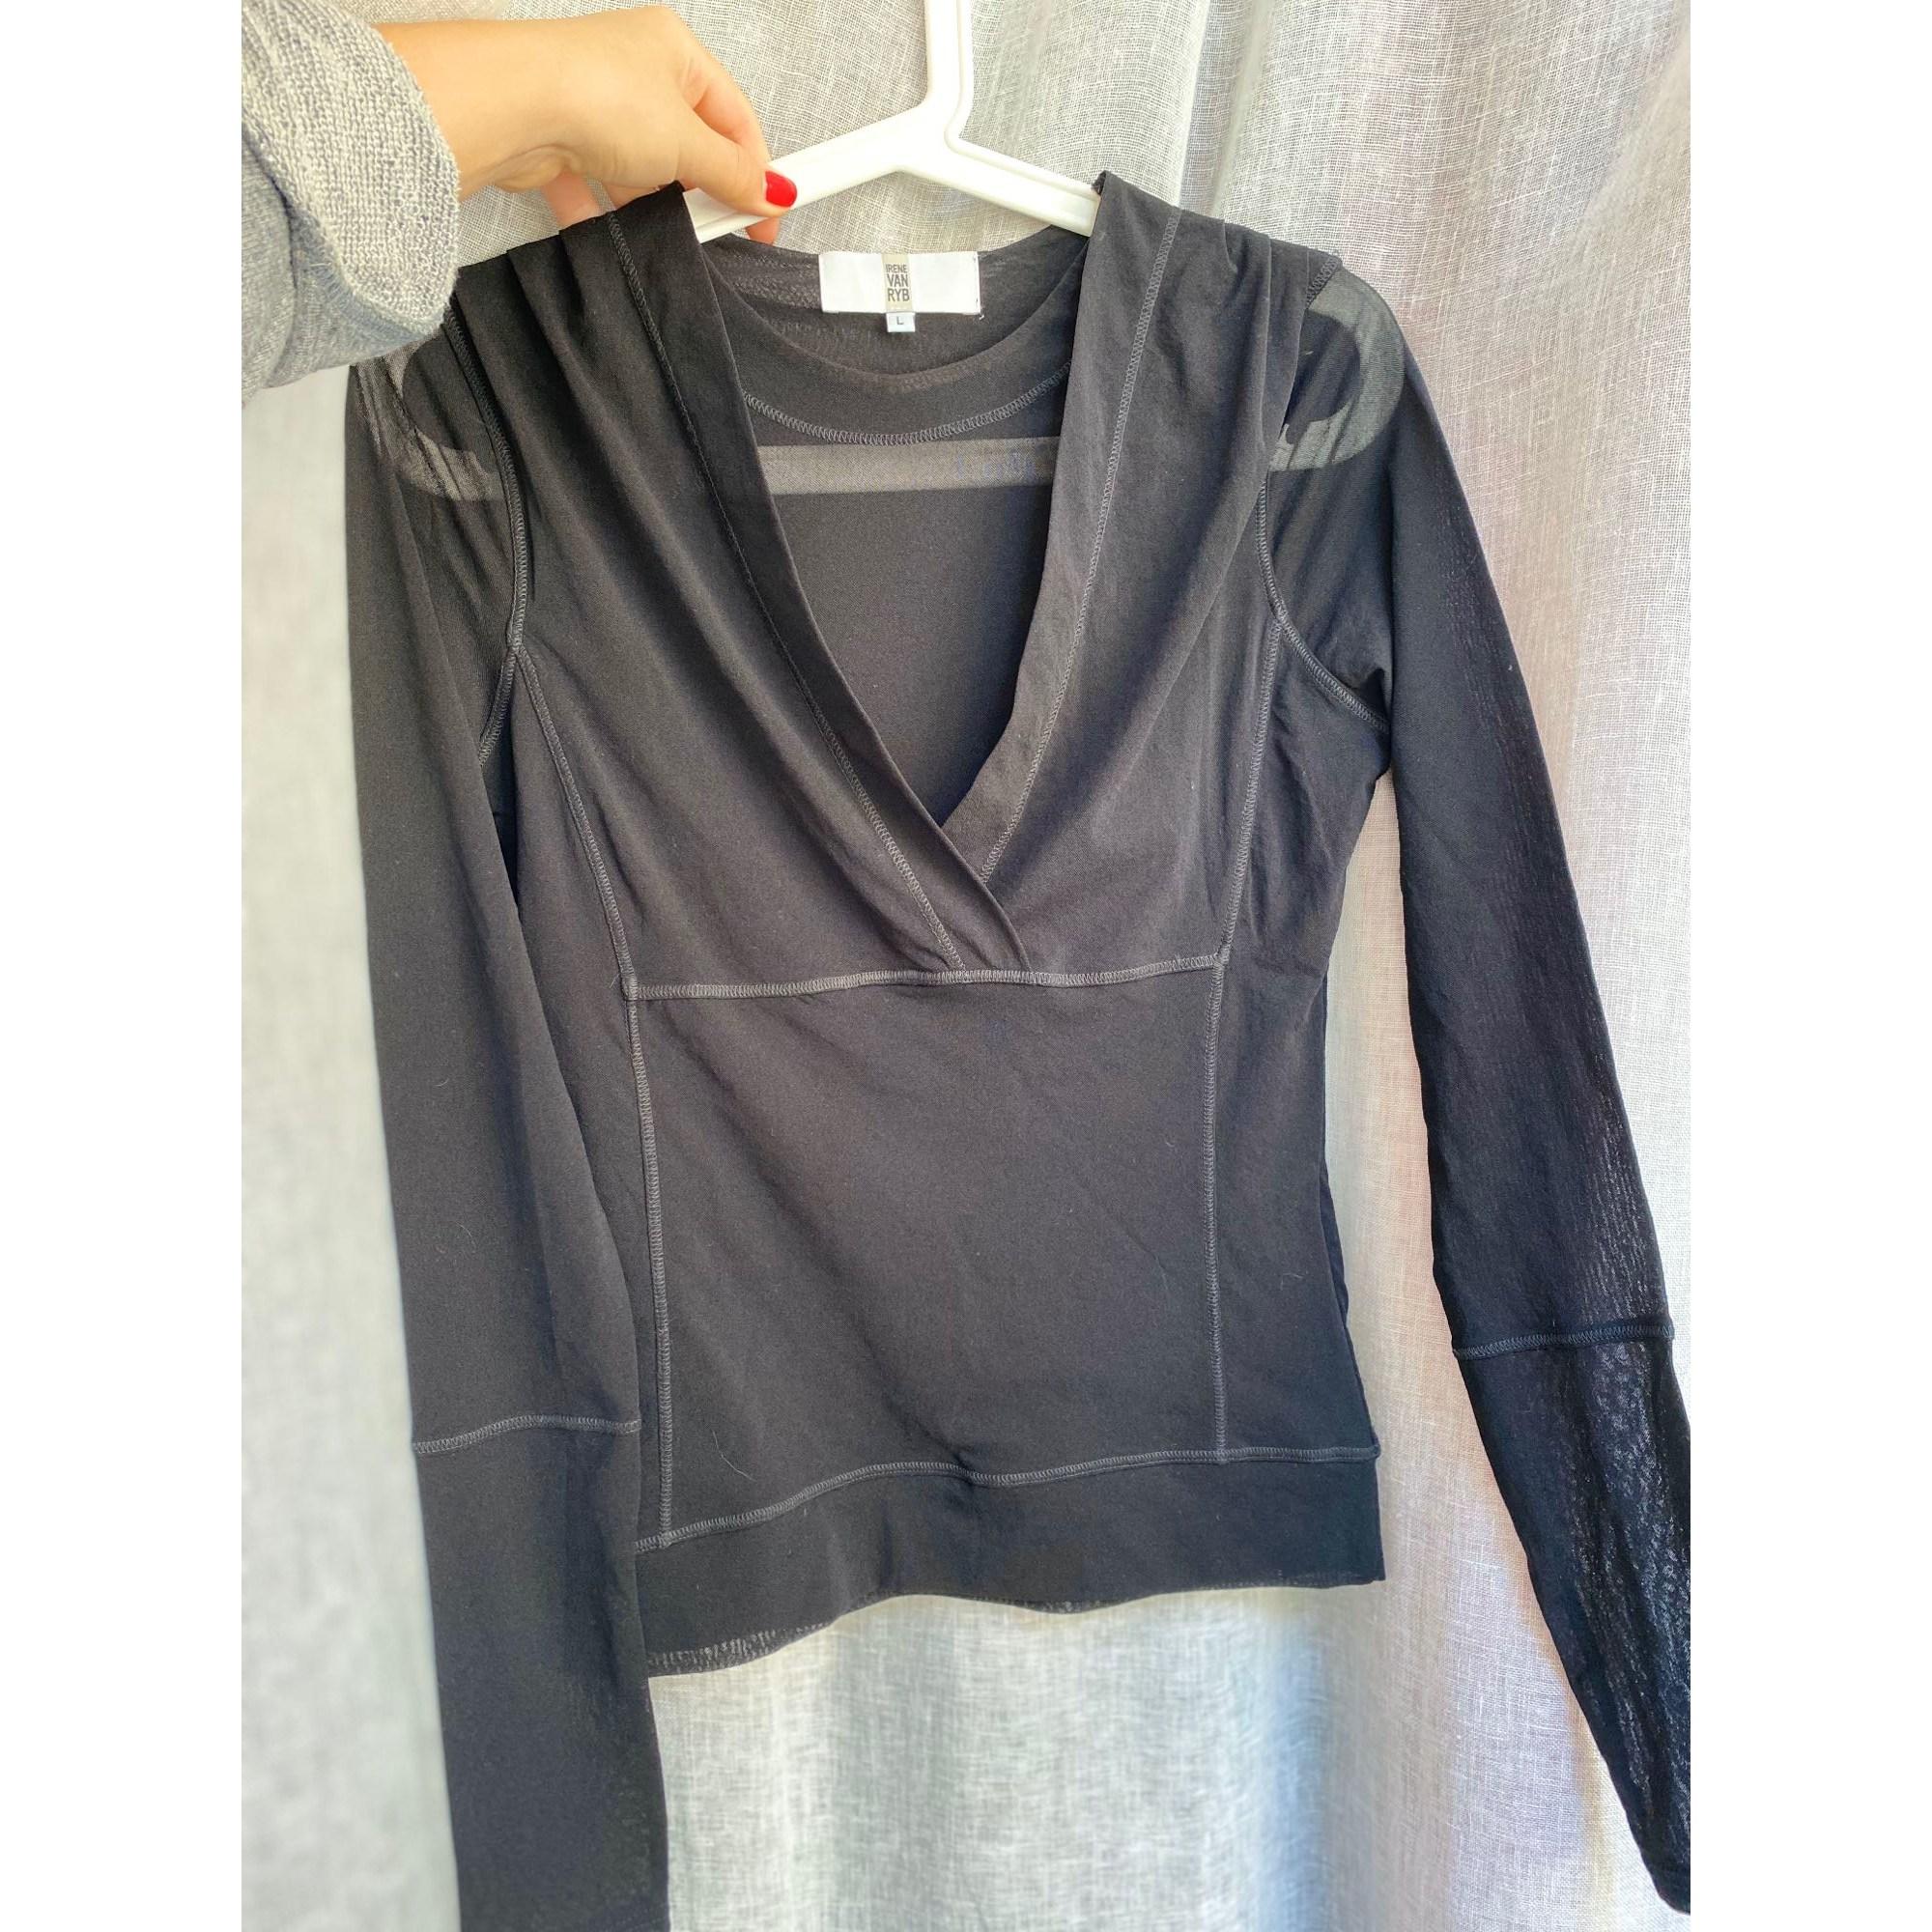 Top, tee-shirt IRENE VAN RYB Noir